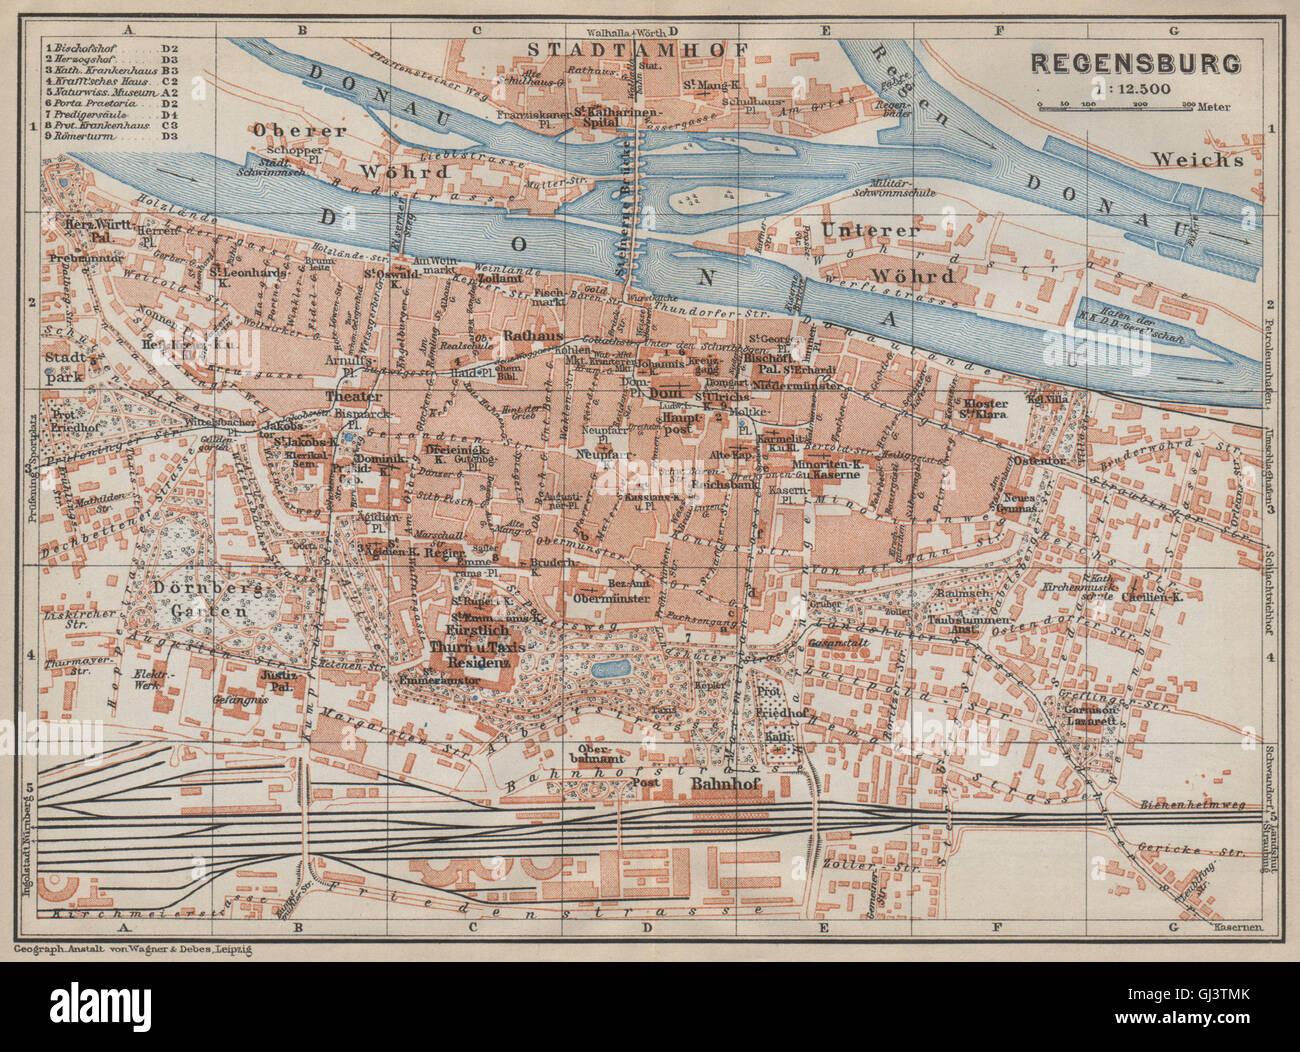 REGENSBURG Town City Stadtplan Bavaria Ratisbon Stadtamhof - Regensburg map